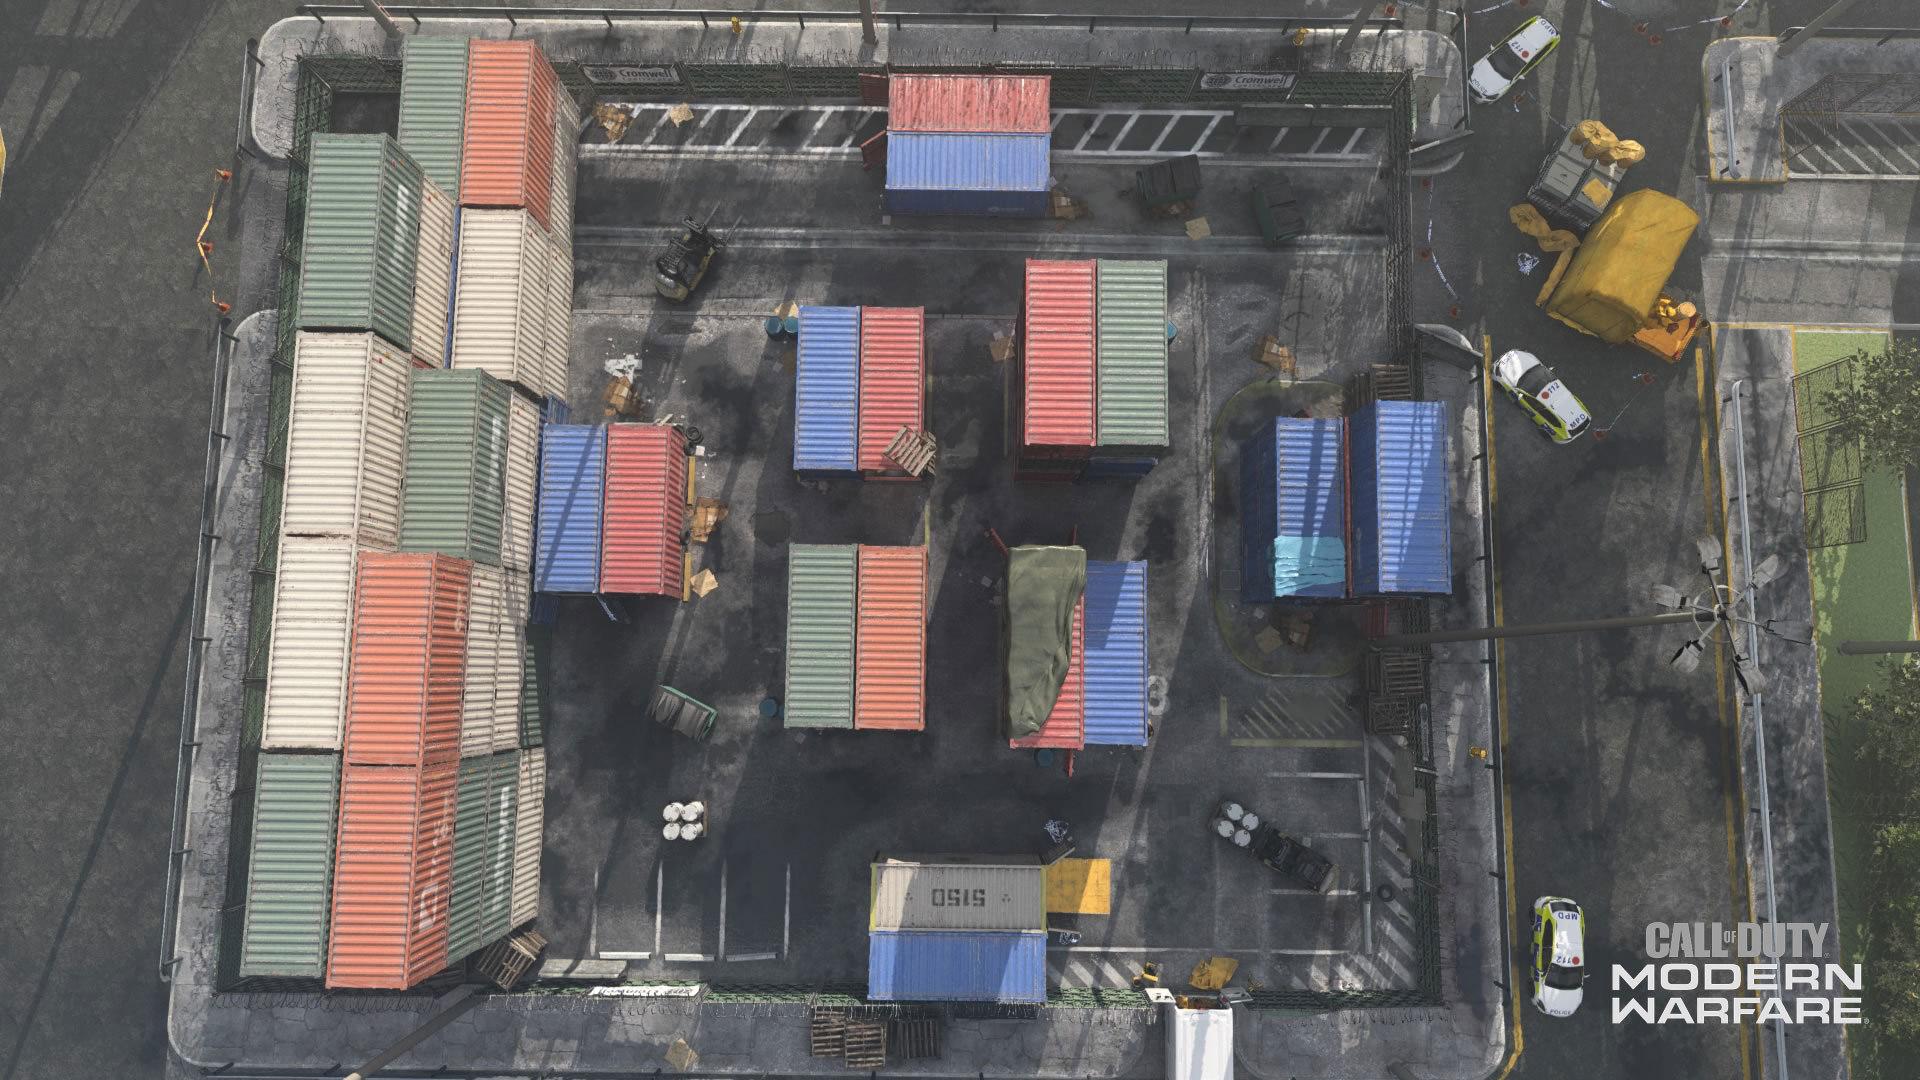 Call Of Duty: Modern Warfare's crowded April Fool's Shipment playlist returns